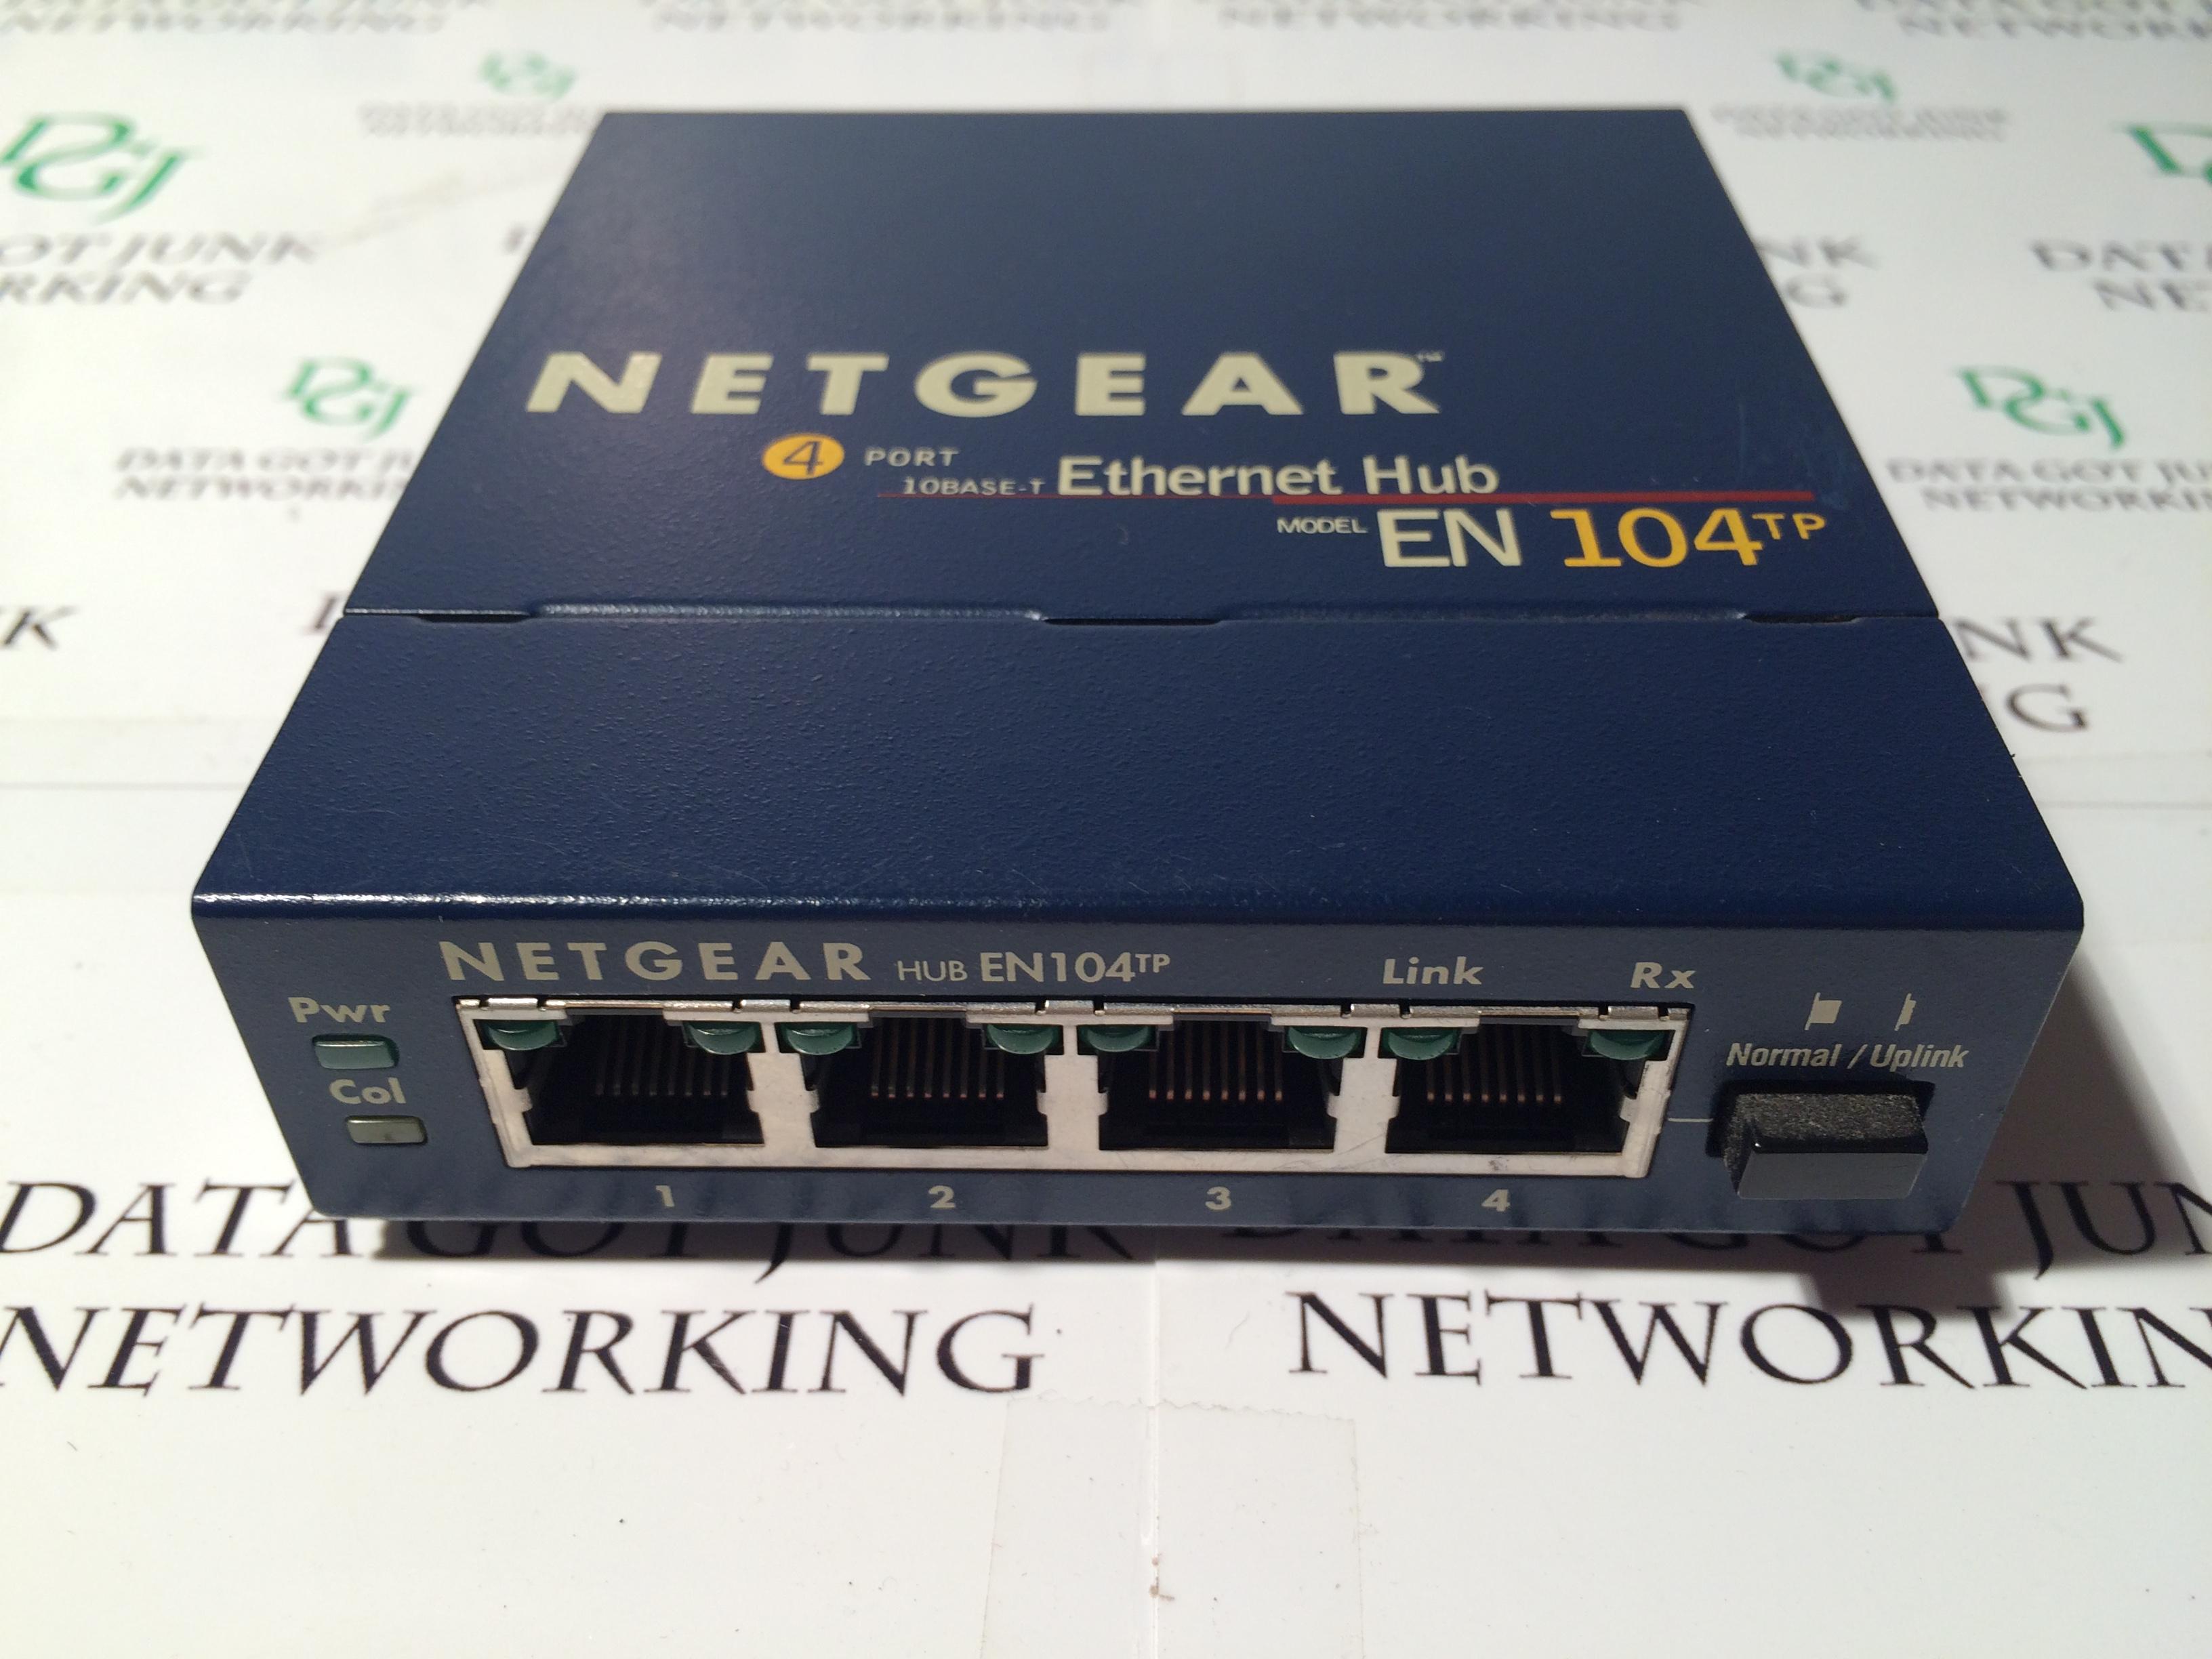 Netgear en104 4 port 10base t ethernet network hub - Ethernet cable hub 4 ports ...